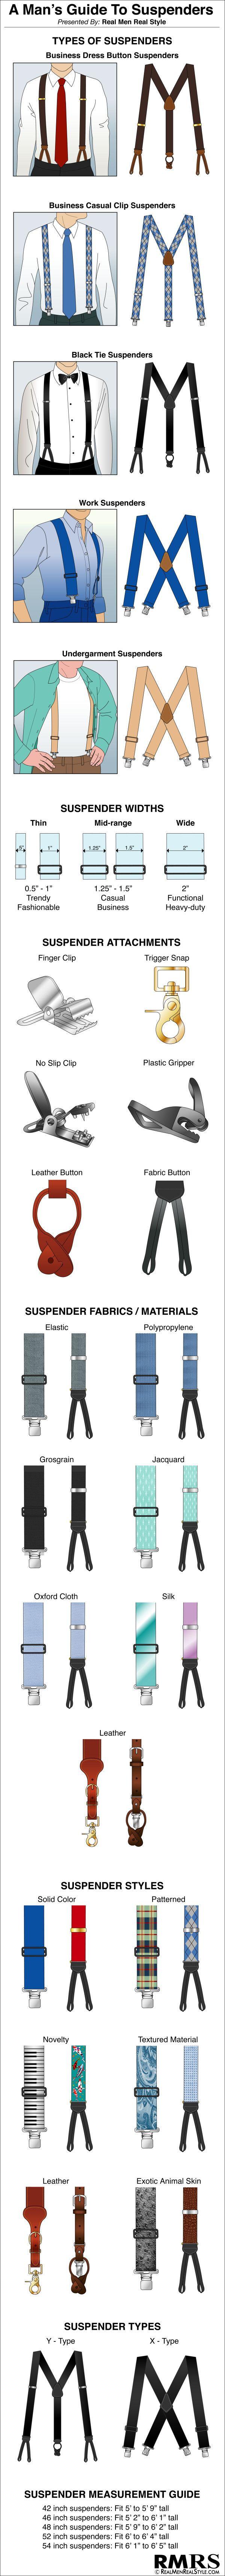 Infographic over bretels dragen